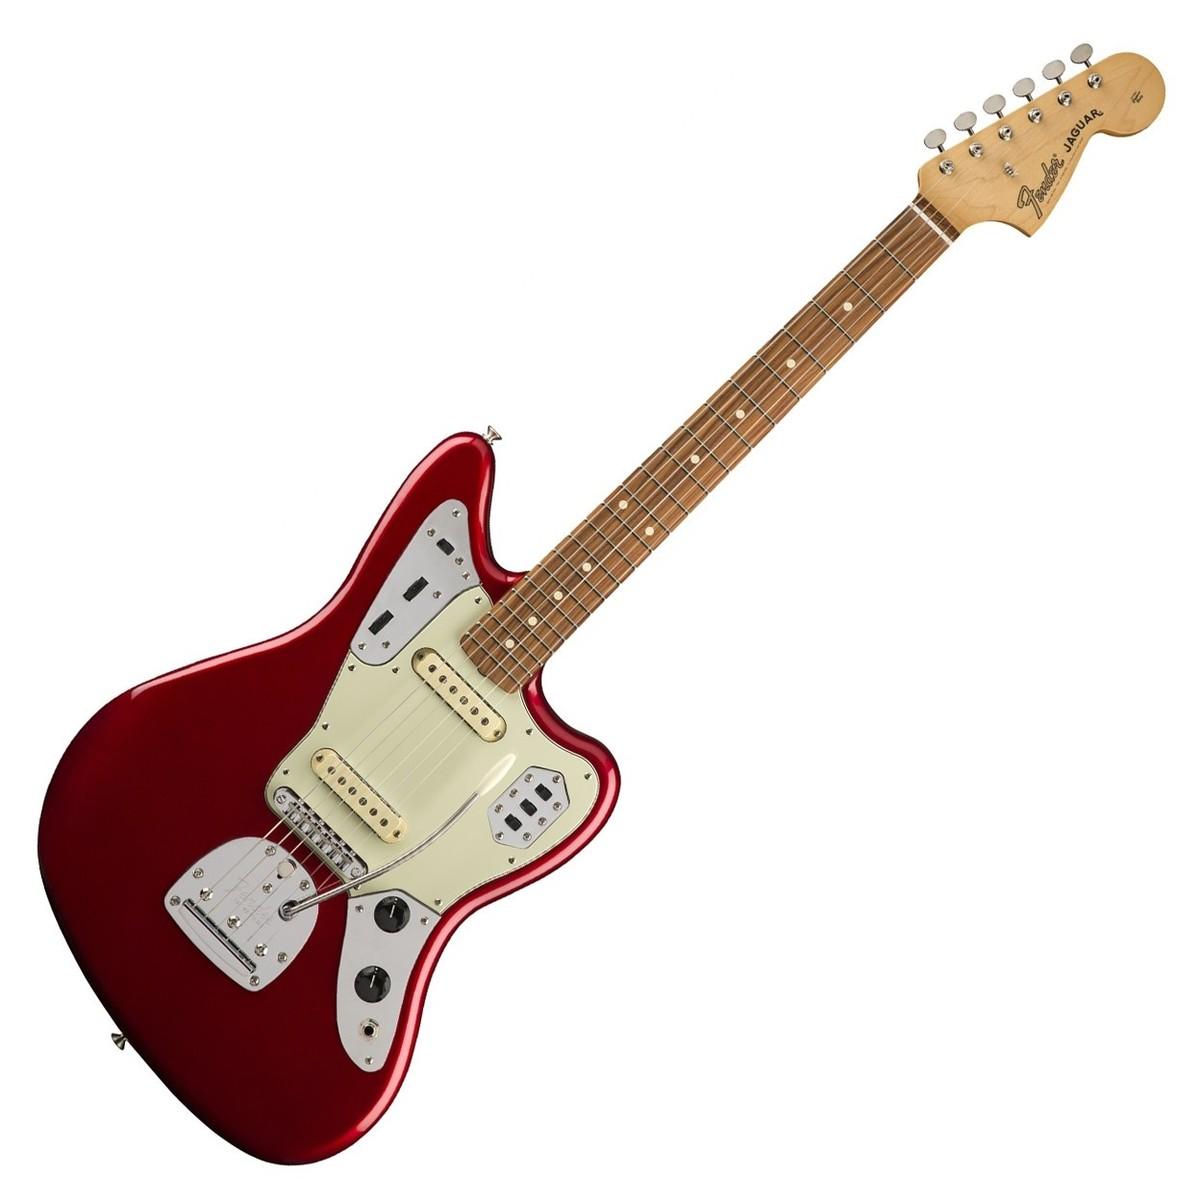 pre guitar fen fender collector jag info vintage jaguar wht cbs